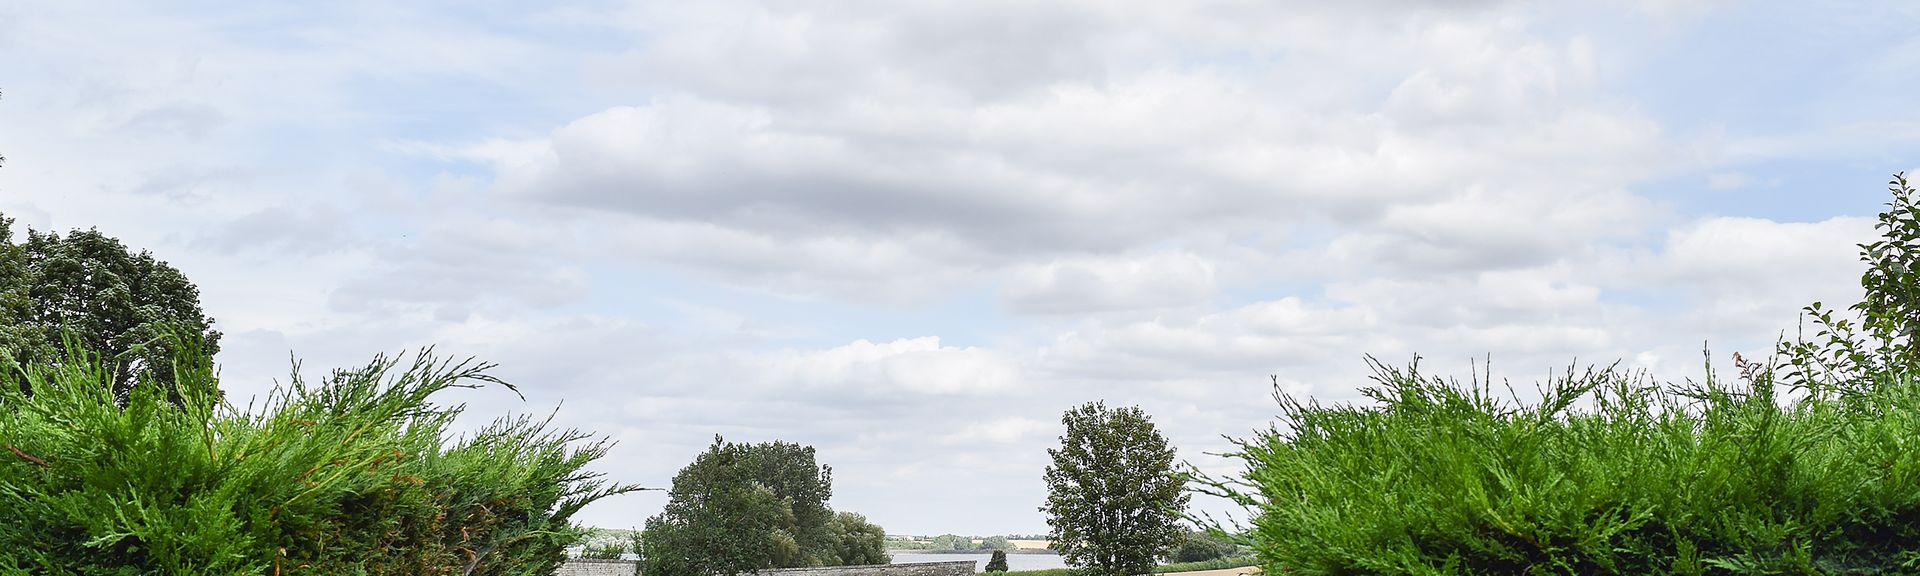 Melton, Leics, Angleterre, Royaume-Uni